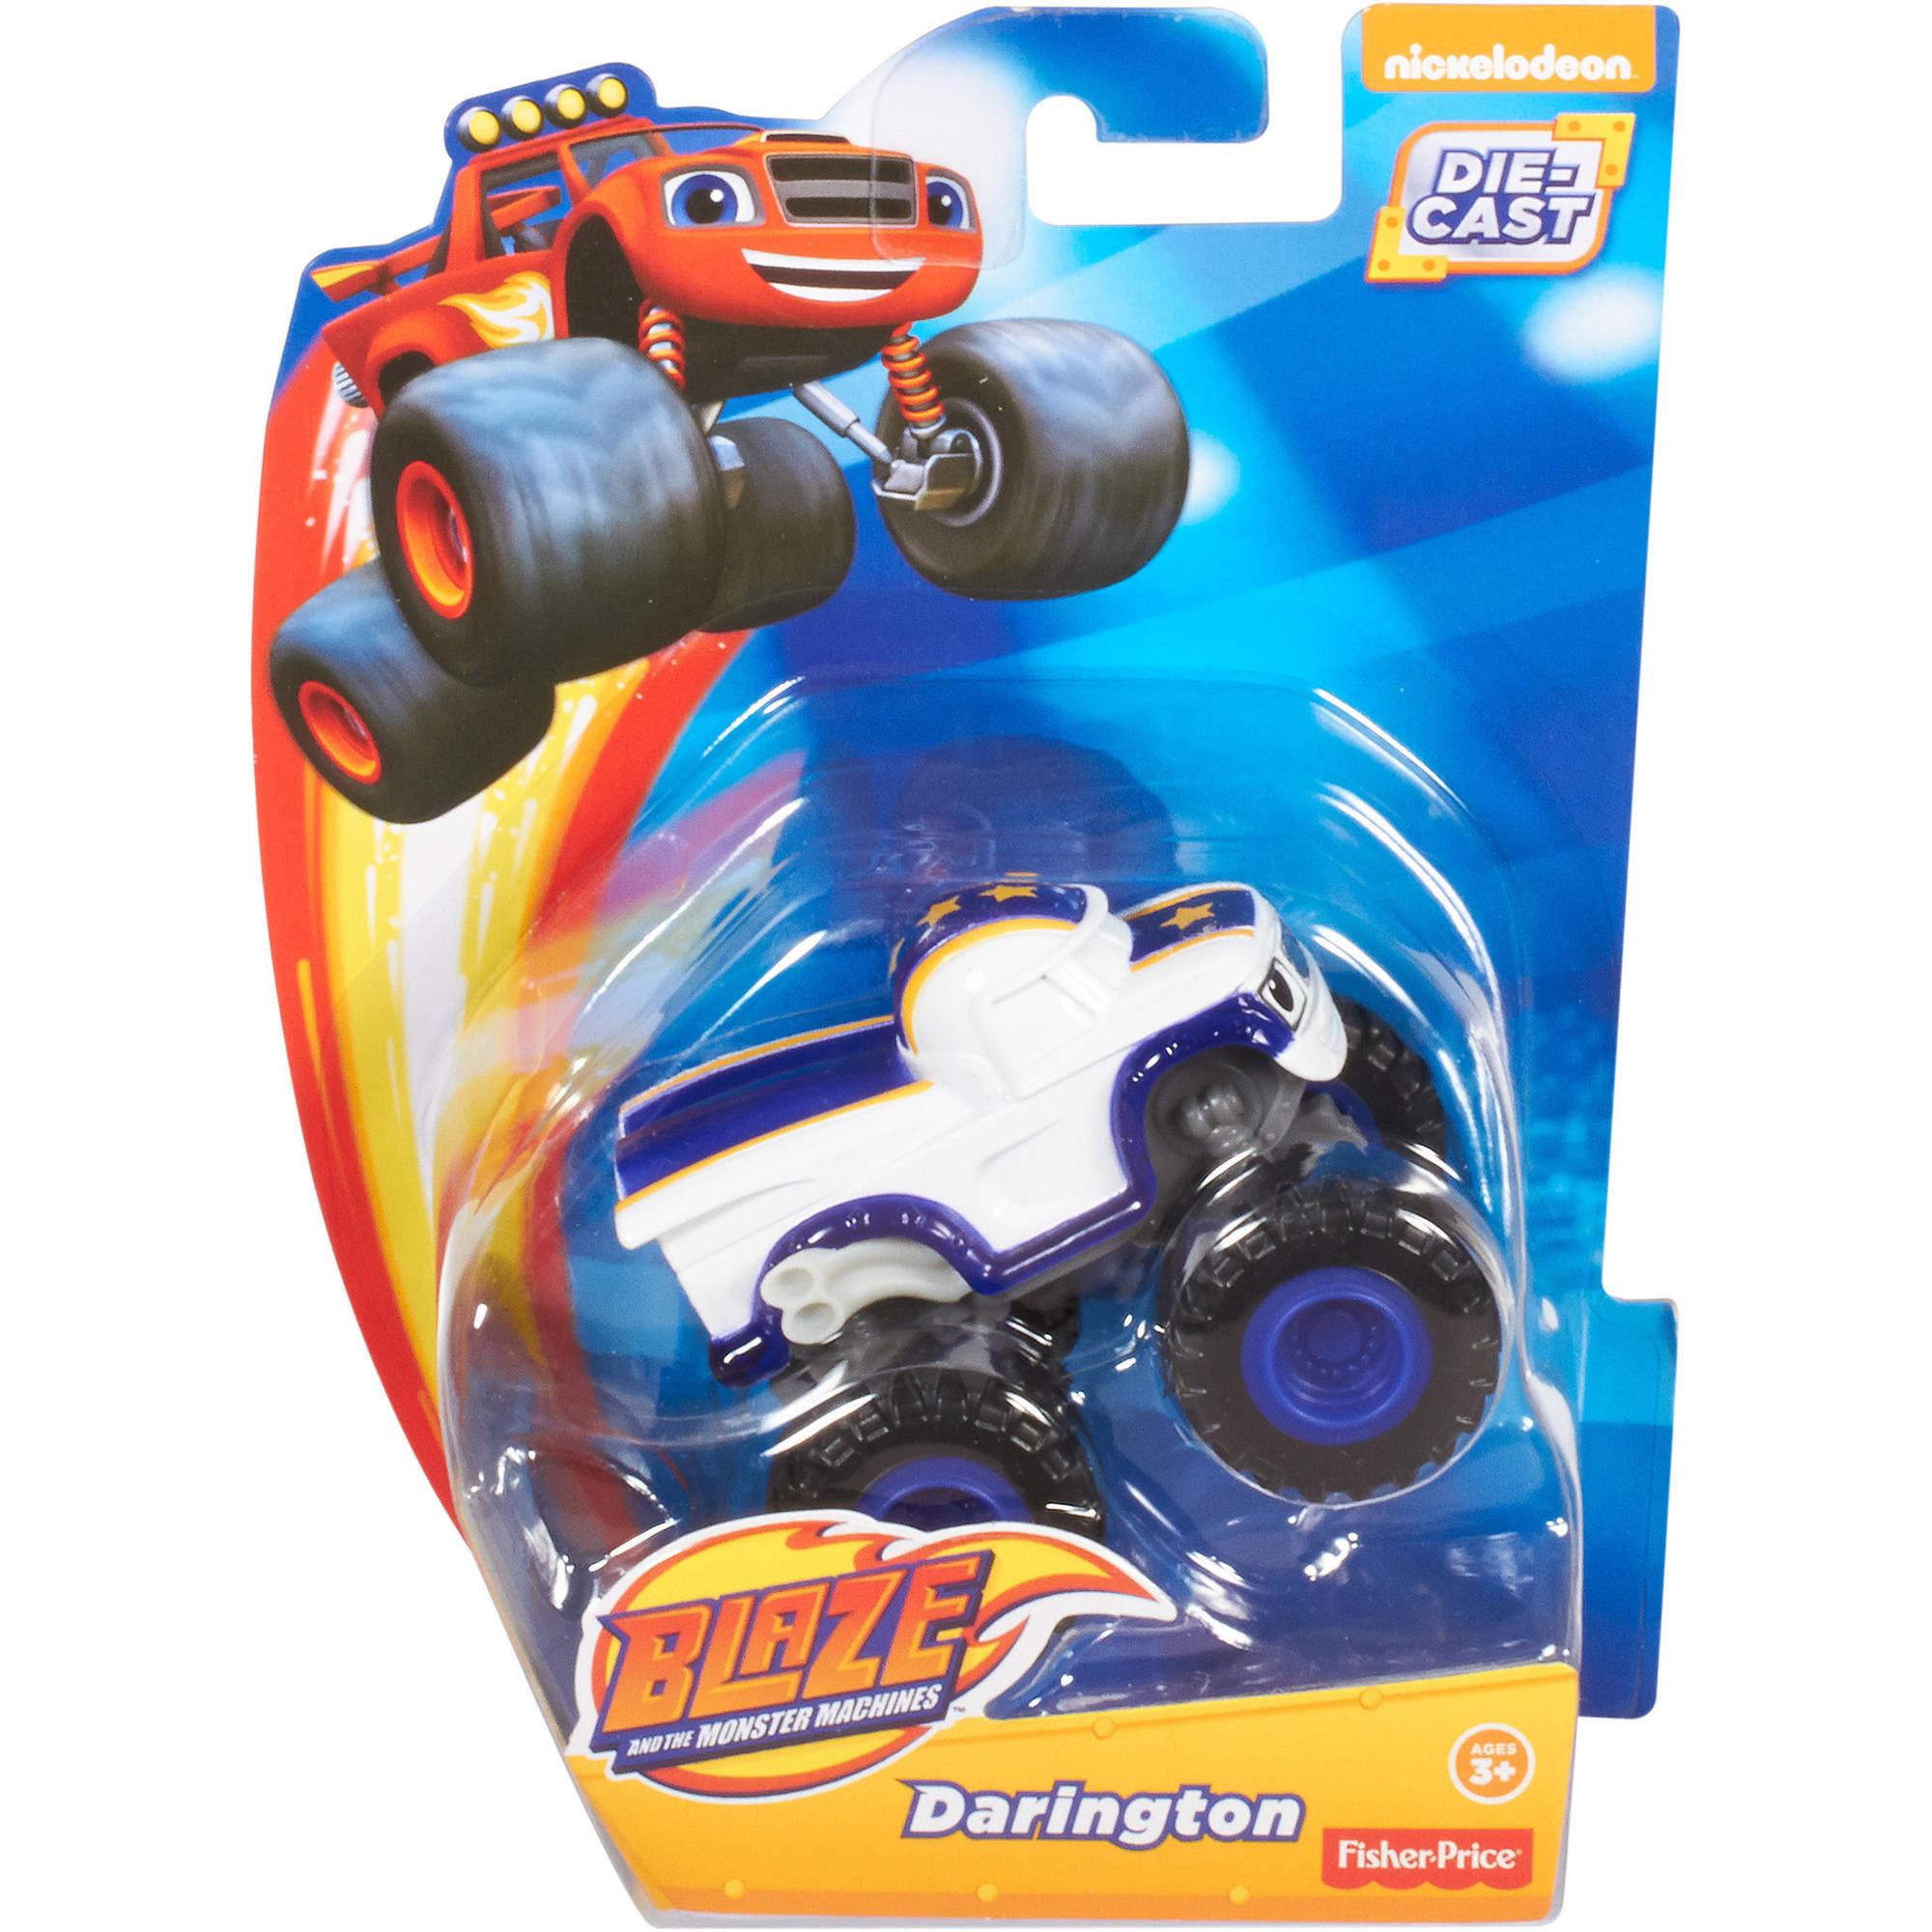 Blaze and the Monster Machines Darrington Vehicle